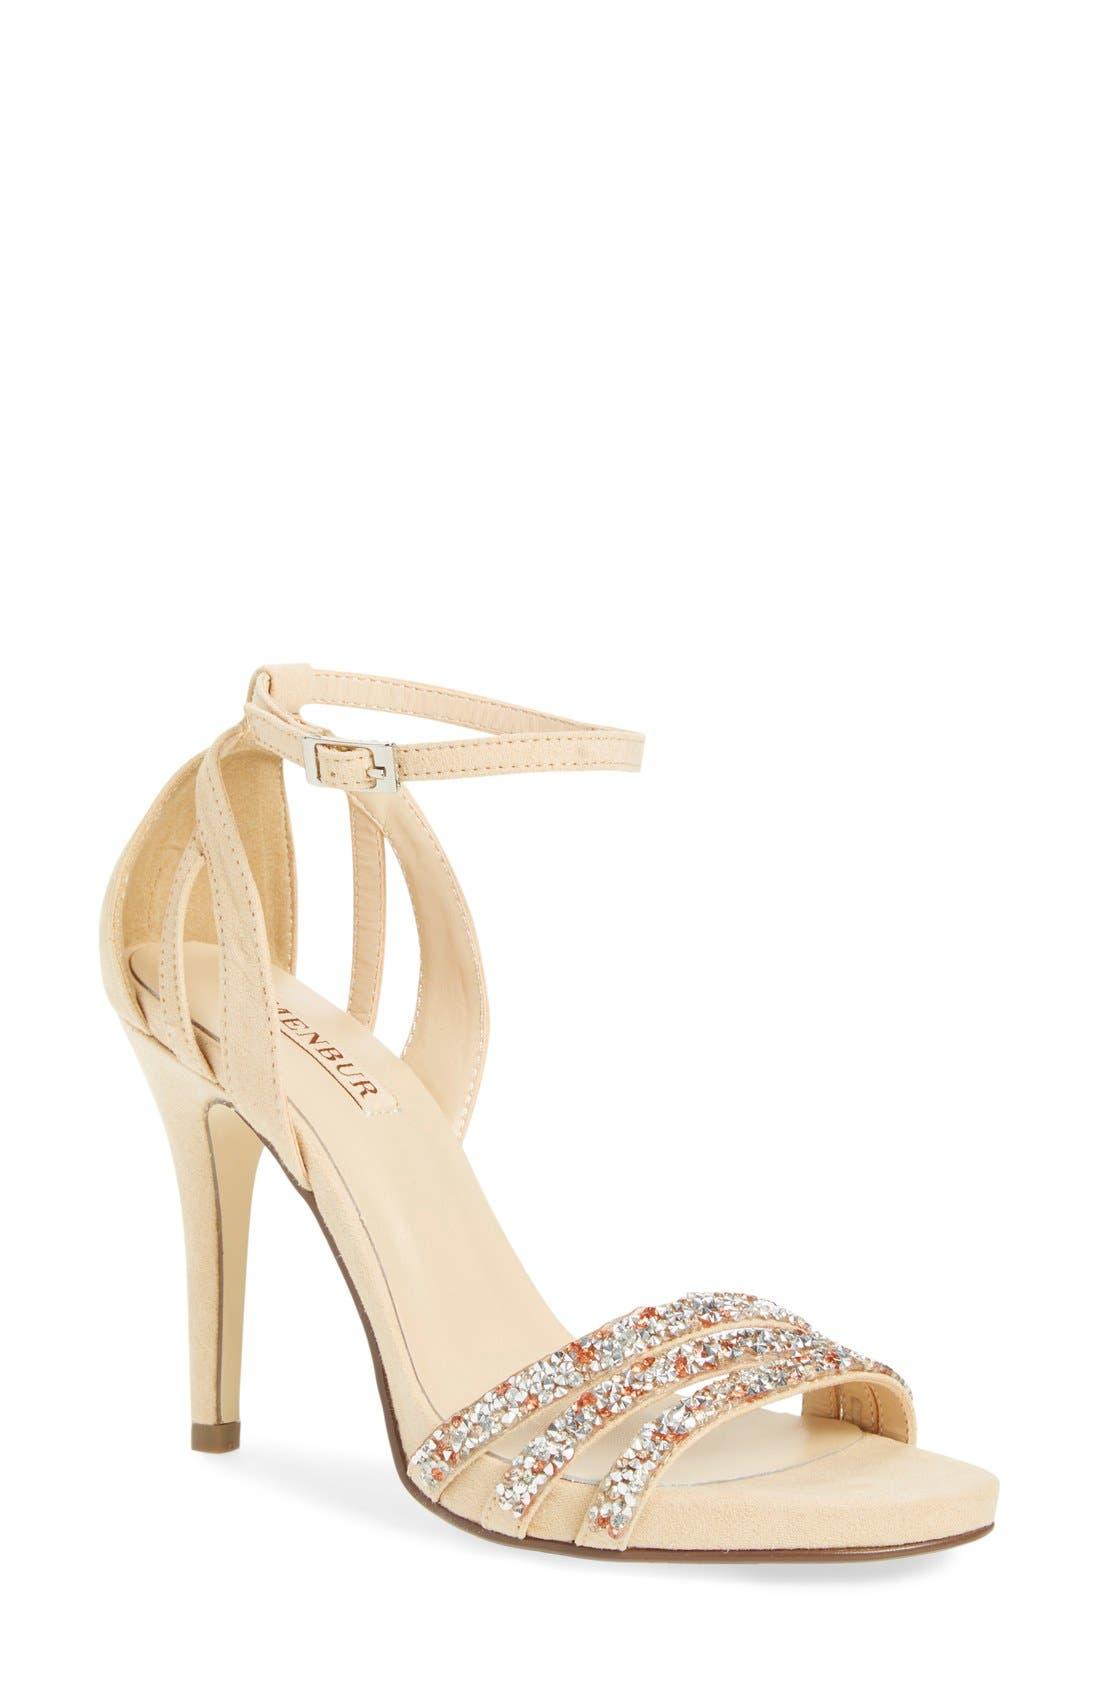 Main Image - Menbur 'Pensamiento' Ankle Strap Sandal (Women)